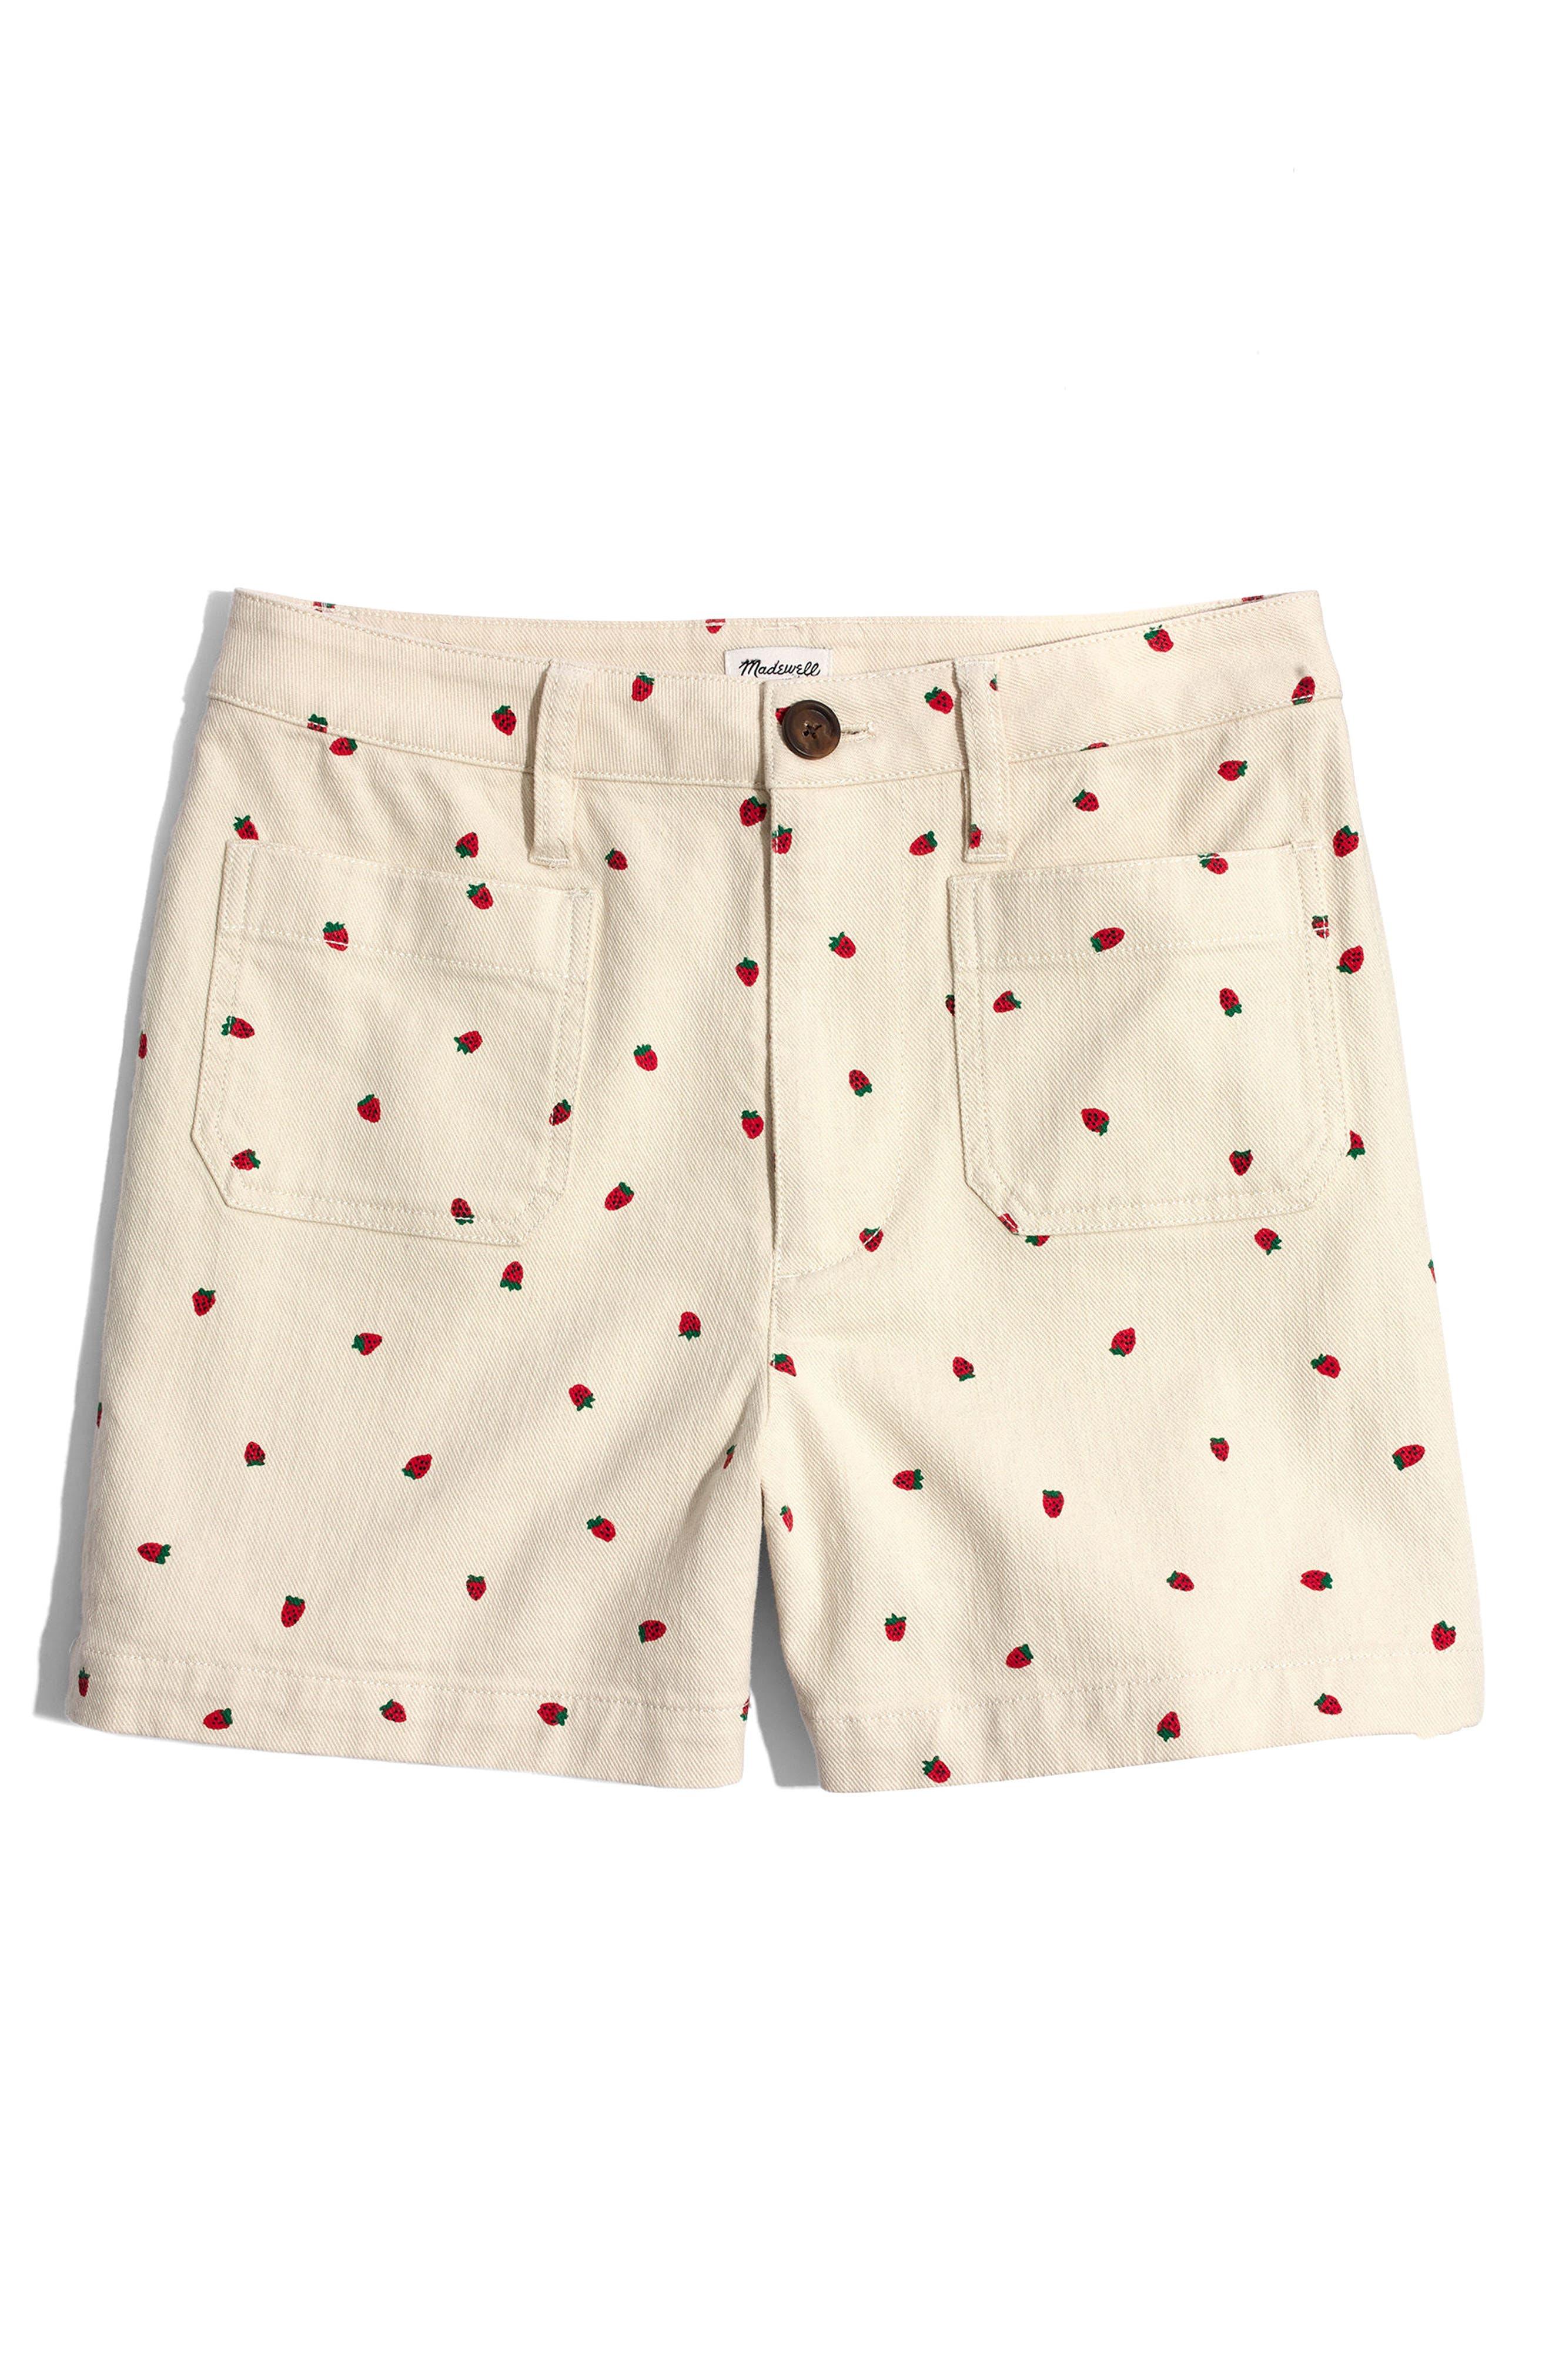 Emmett Fresh Strawberries Shorts,                             Alternate thumbnail 4, color,                             Strawberry Distressed Stone